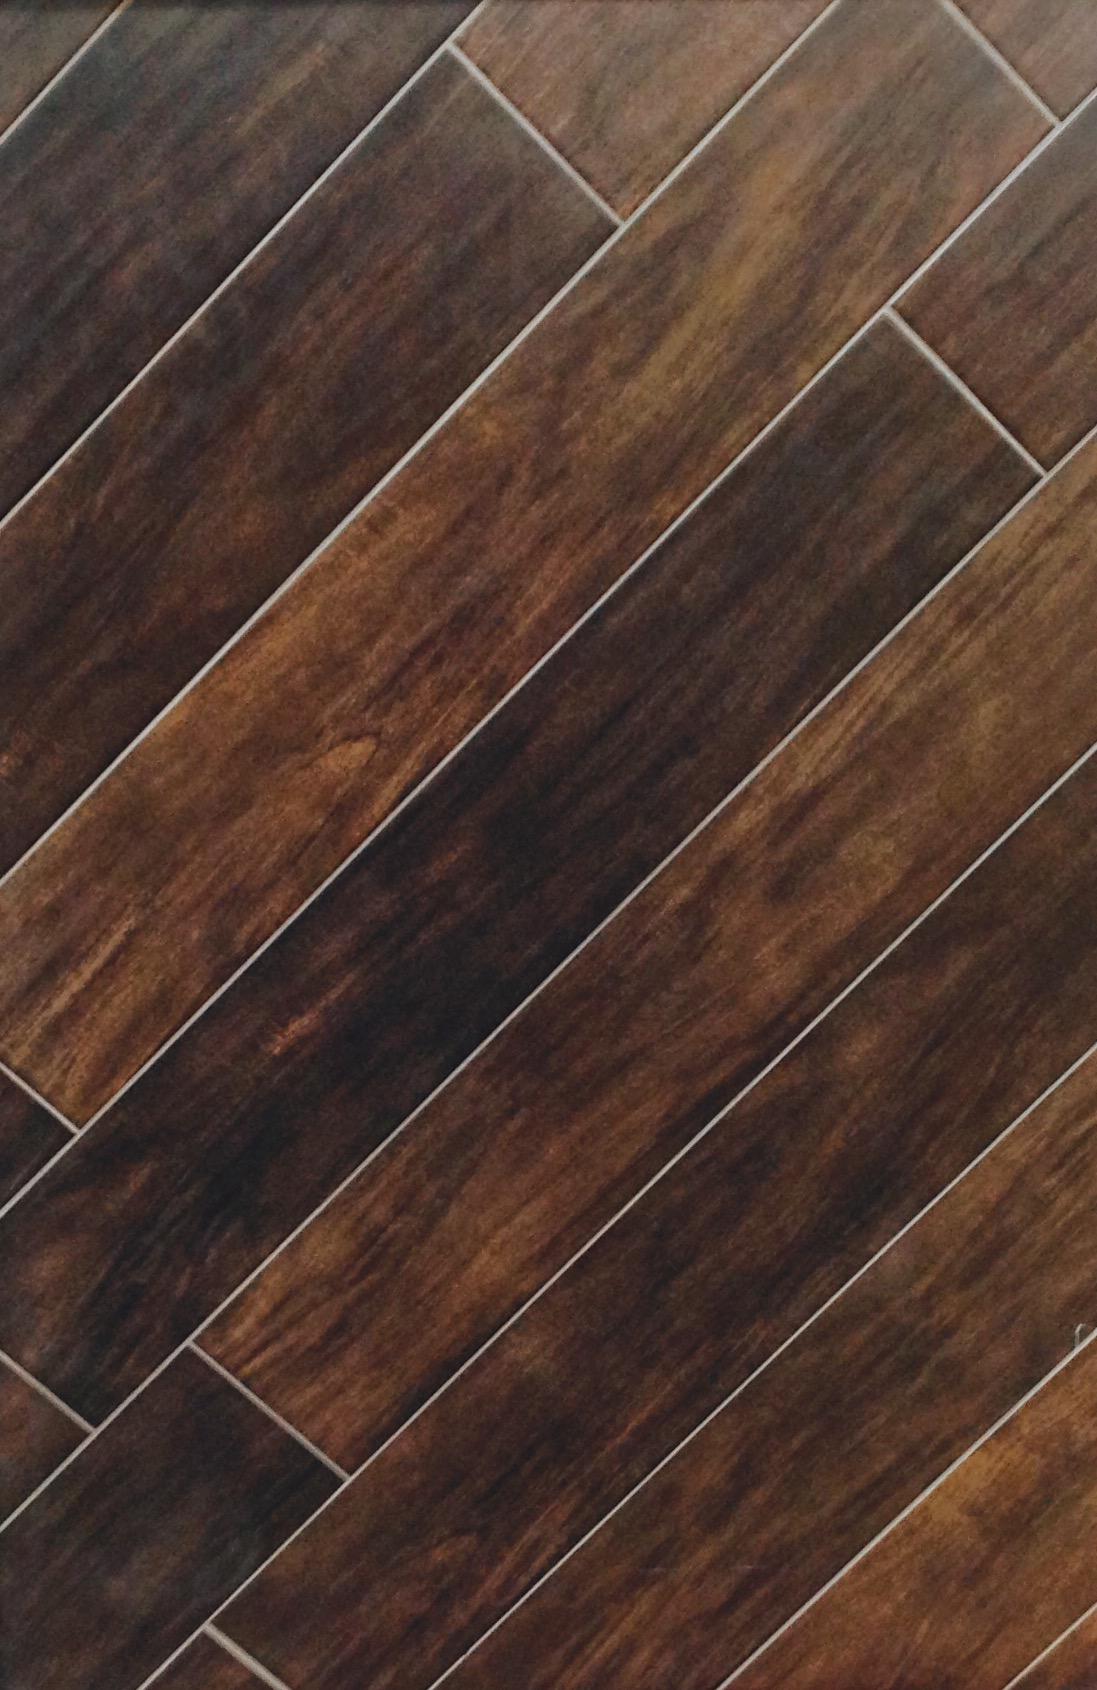 Plank tile flooring plank tile flooring 1 dailygadgetfo Choice Image